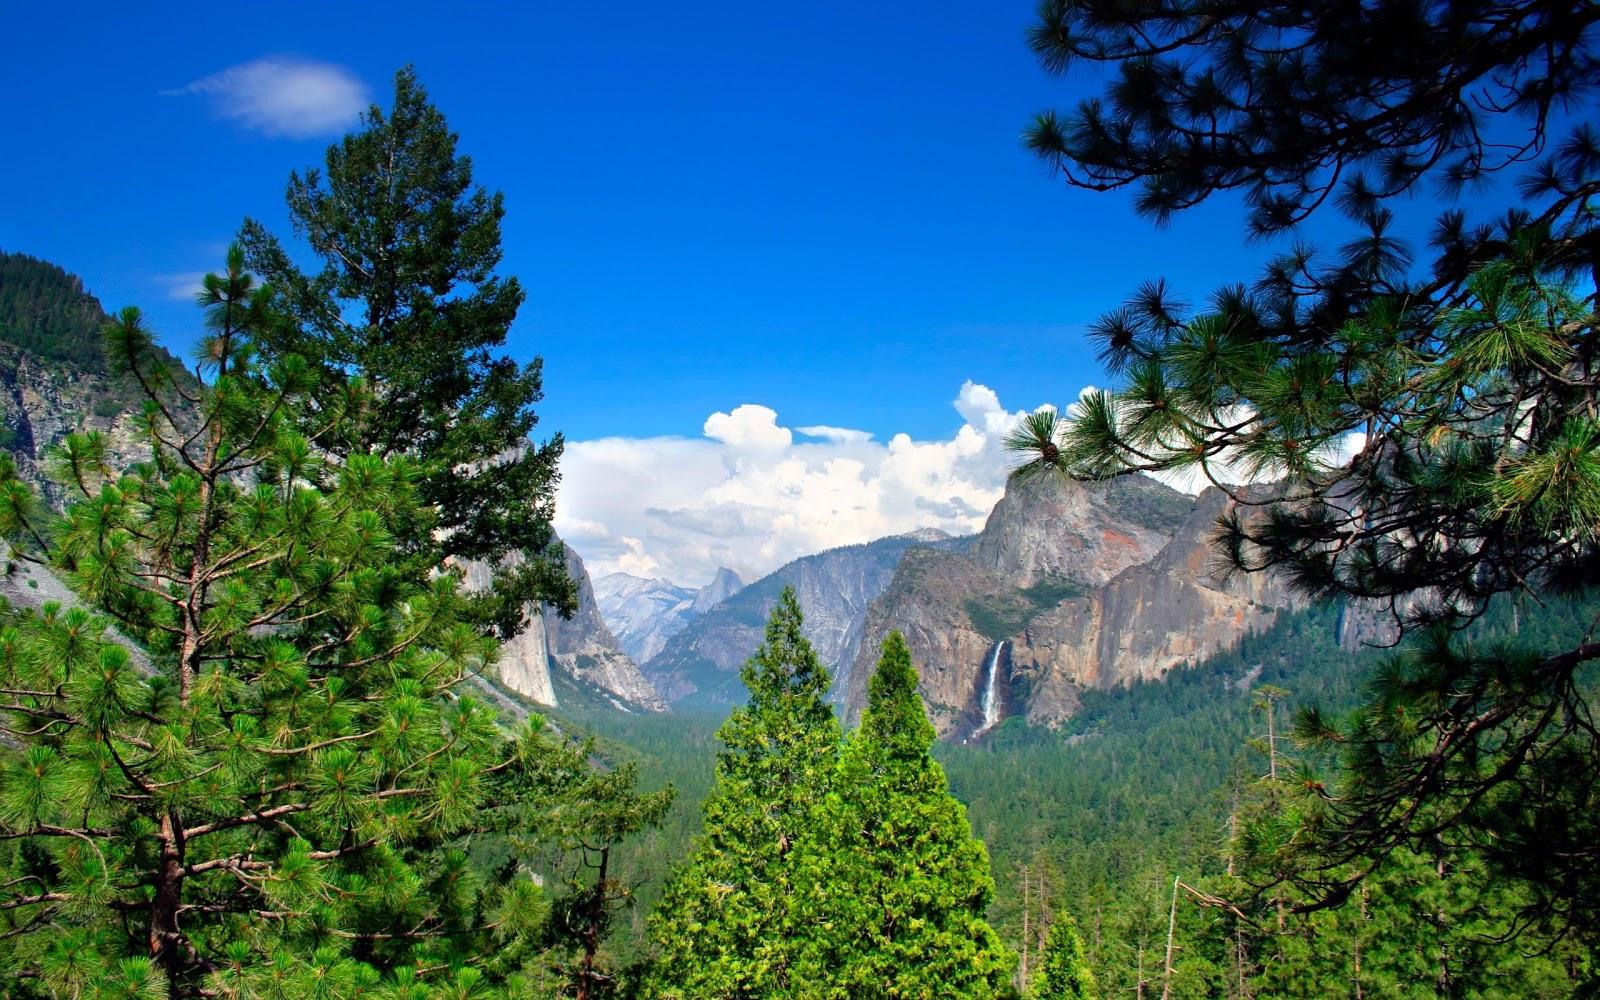 Windows 8 HD Desktop Wallpapers Yosemite Wallpapers 2 1600x1000